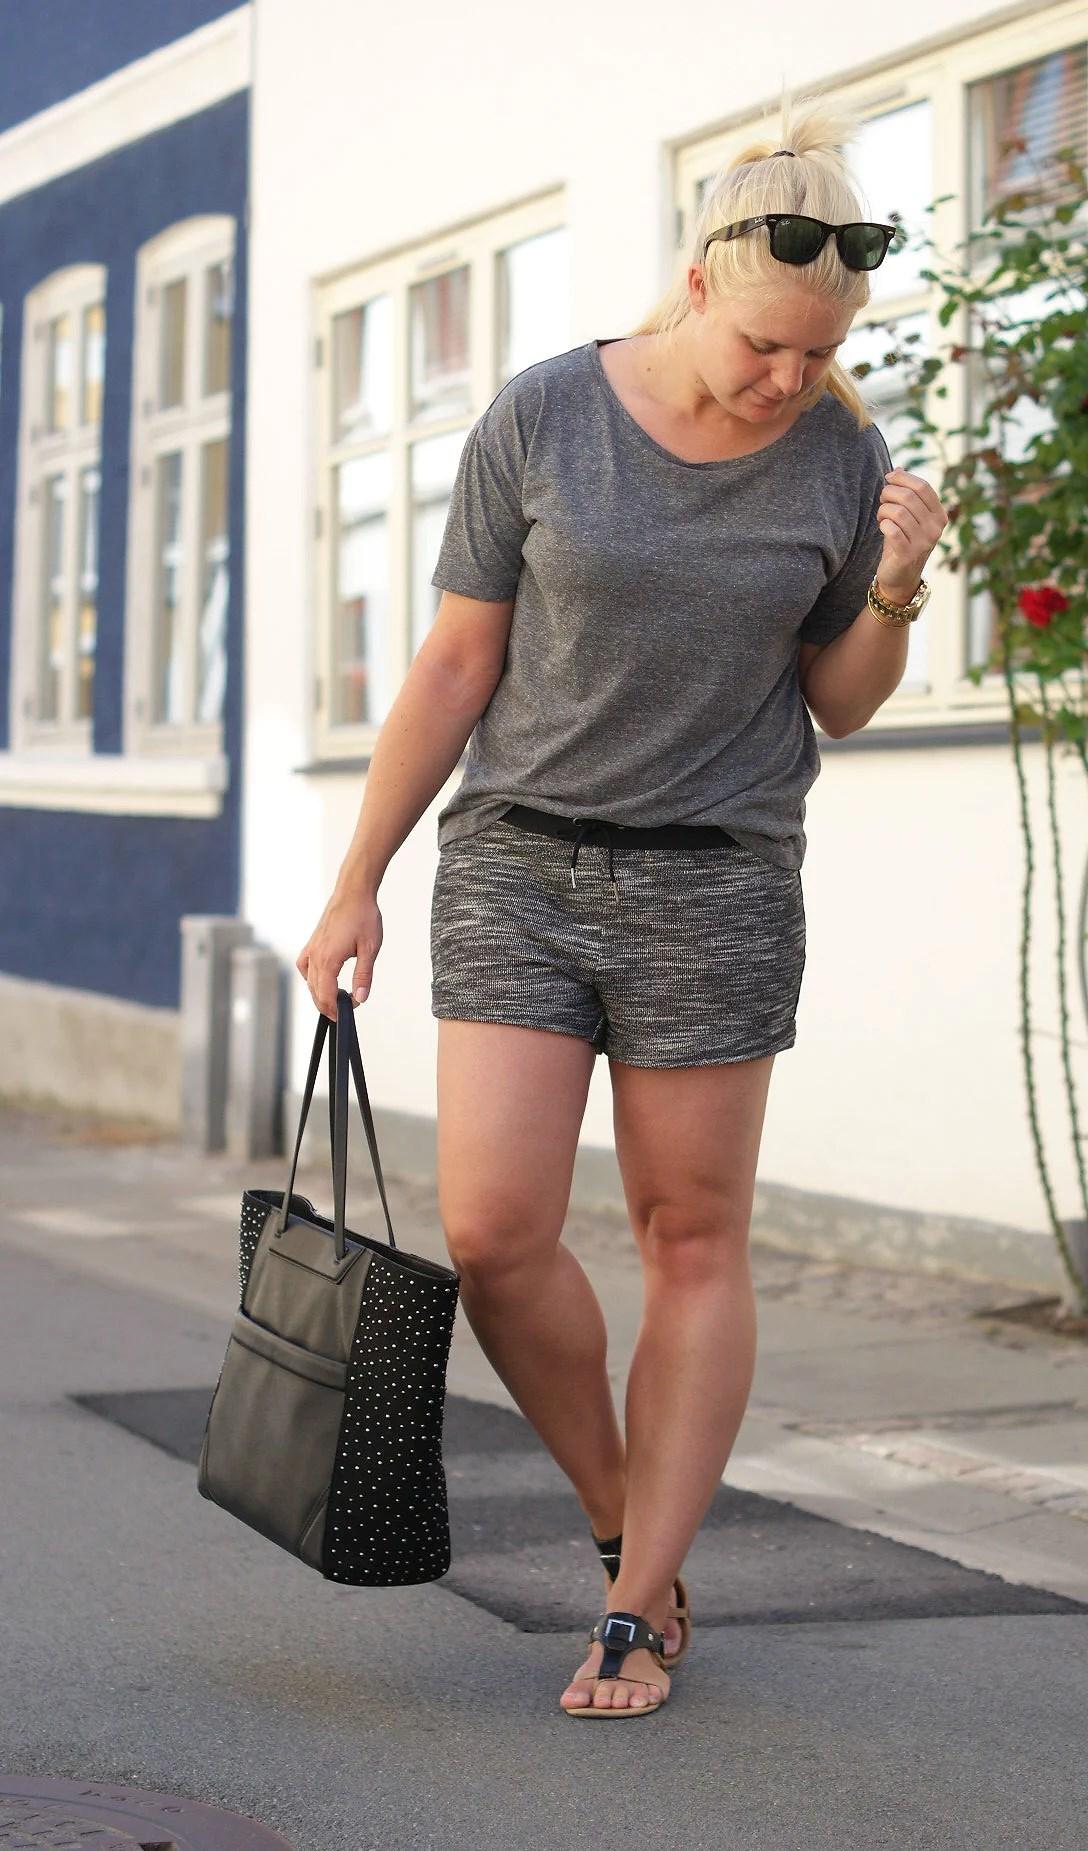 danskmodeblogger